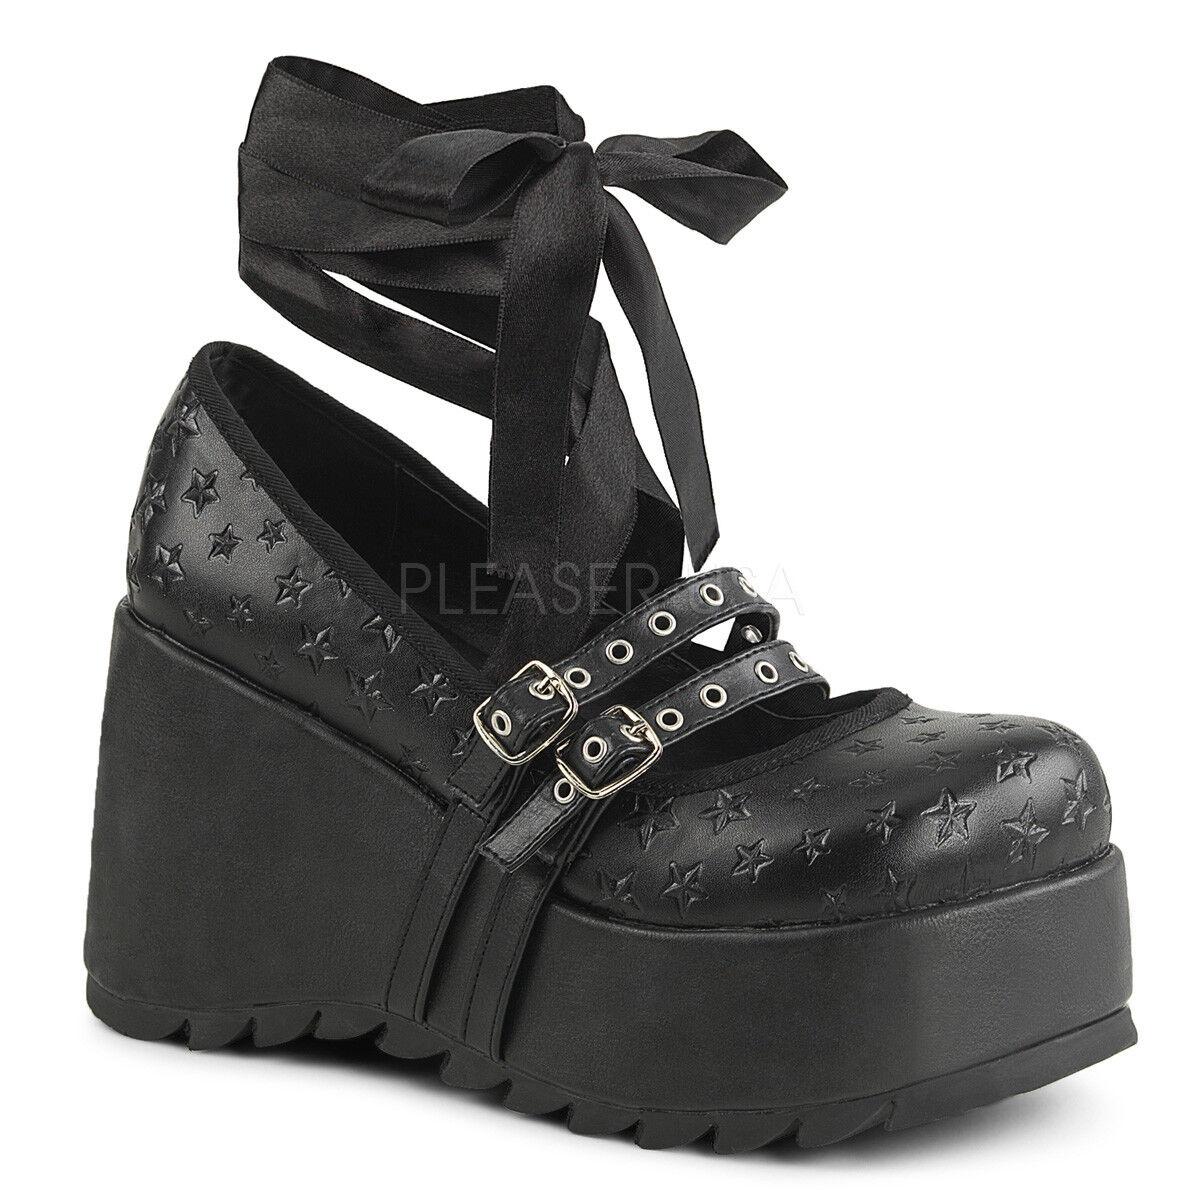 Demonia SCENE-20 SCENE-20 SCENE-20 Womens Punk Goth Black Vegan Leather Platform Maryjane shoes 7d1b02